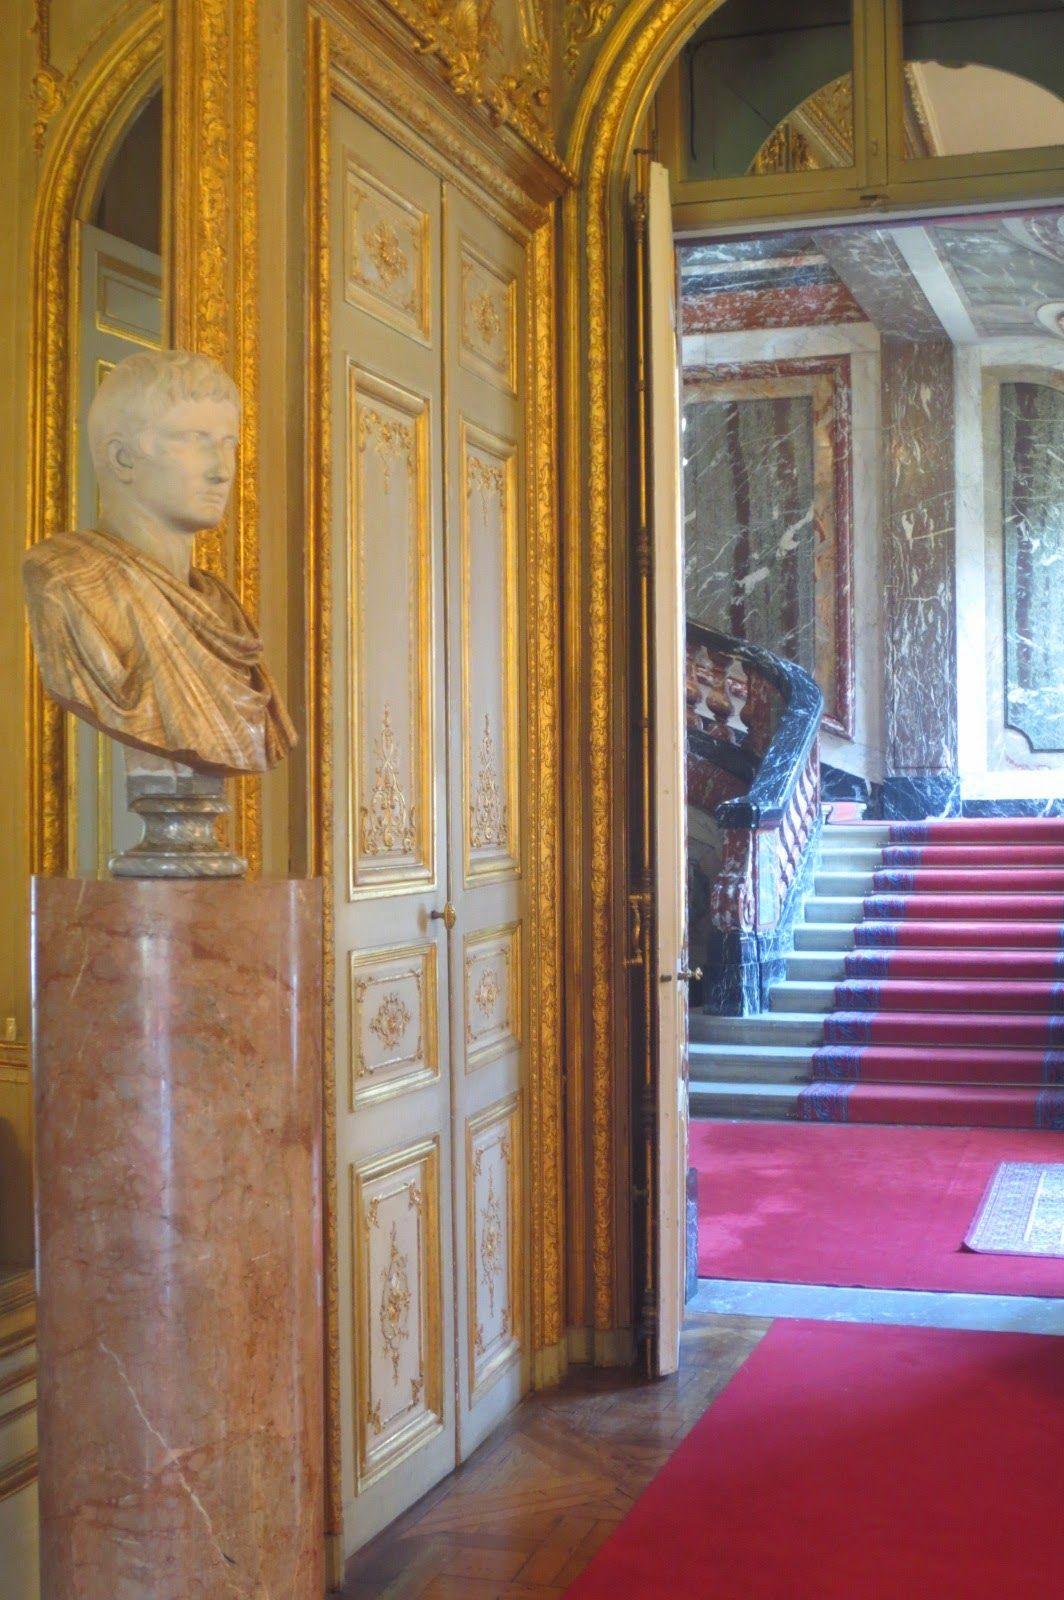 Sala del Mappamondo nel Hôtel de La Rochefoucauld-Doudeauville, Ambasciata d'Italia a Parigi